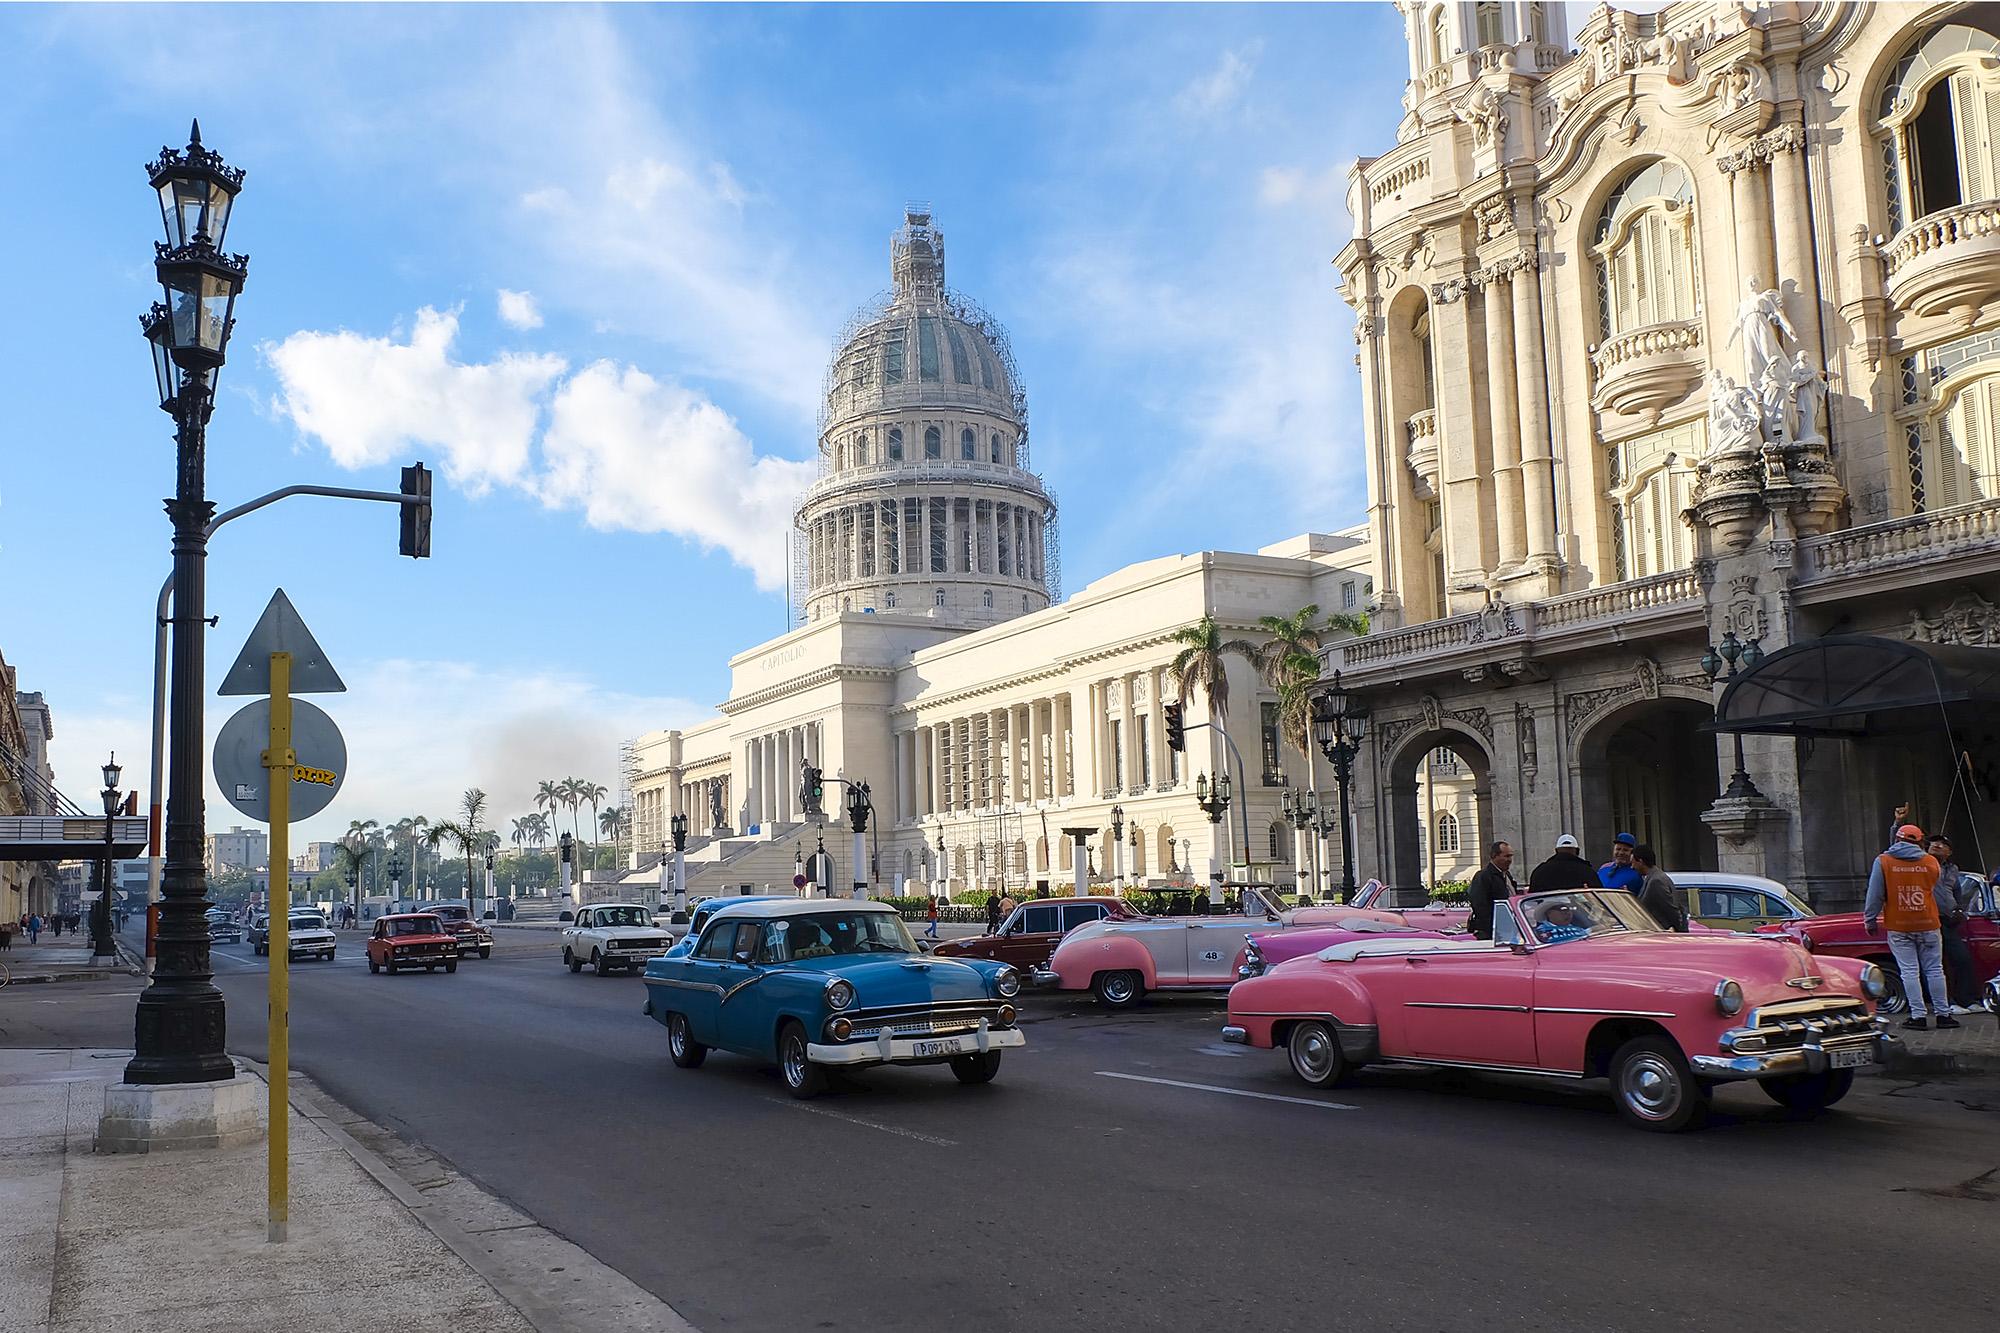 kinh nghiệm du lịch Havana